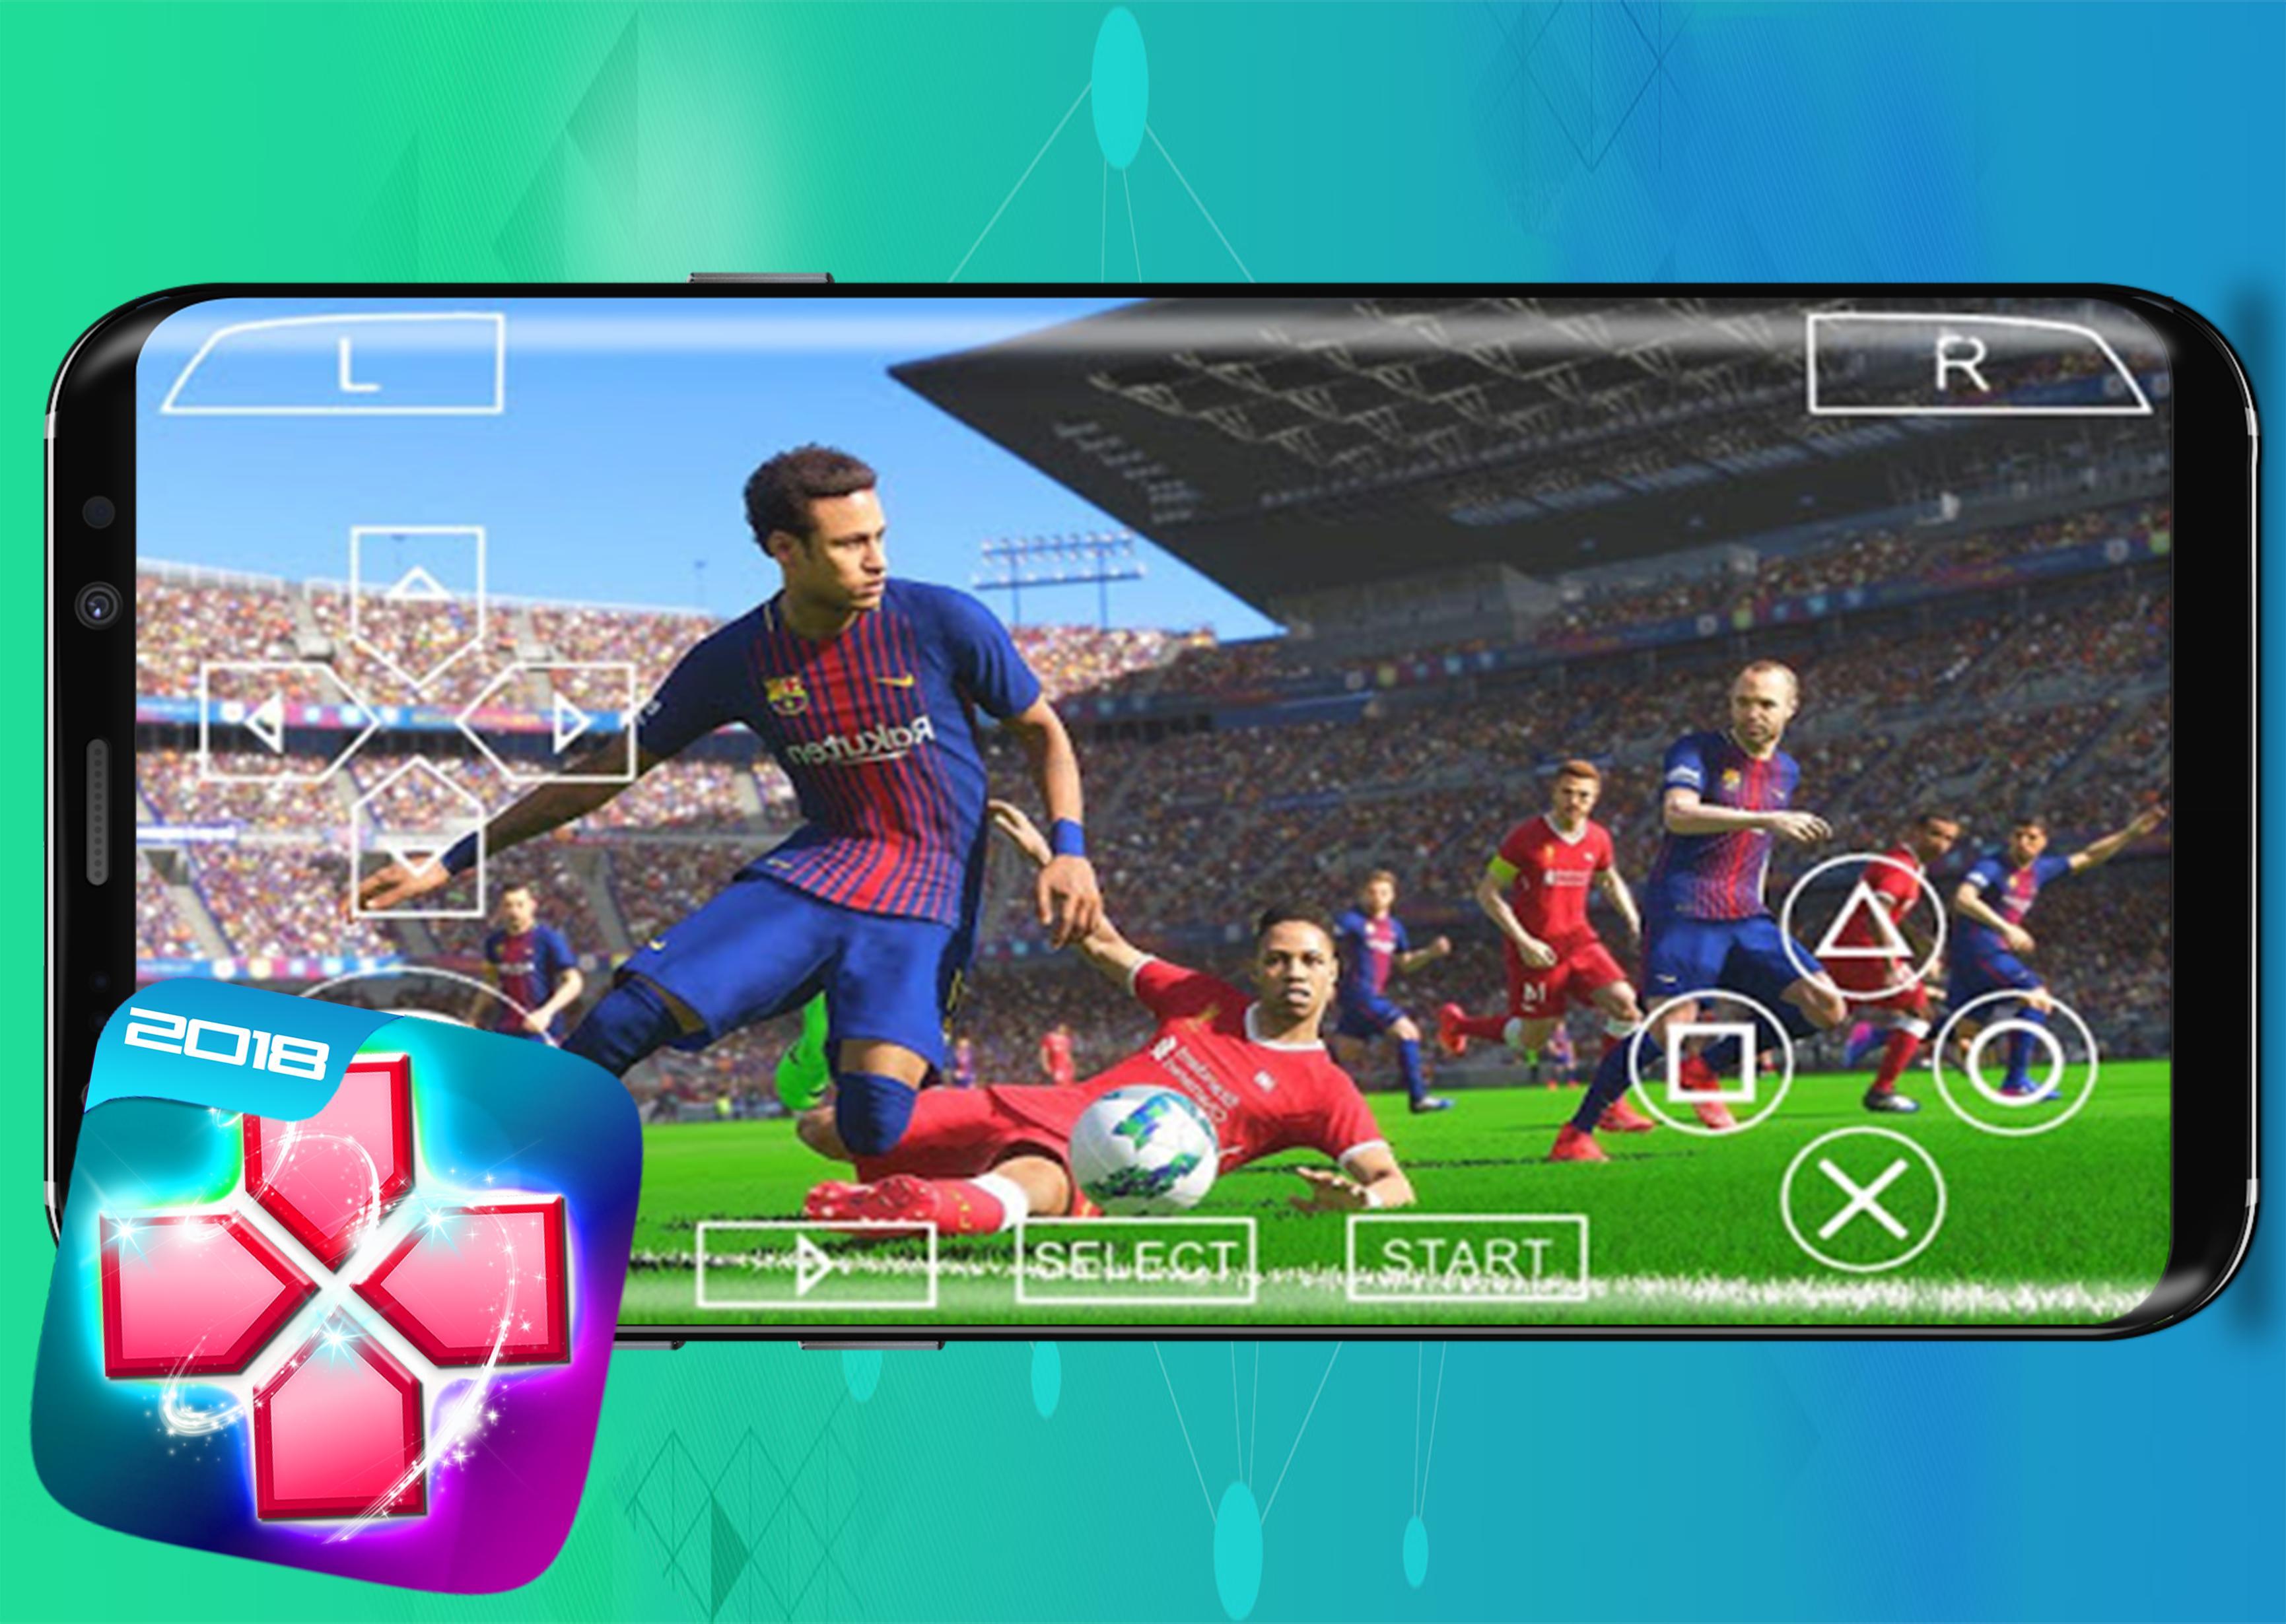 PSP Emulator - PPSPP Emulator for android for Android - APK Download